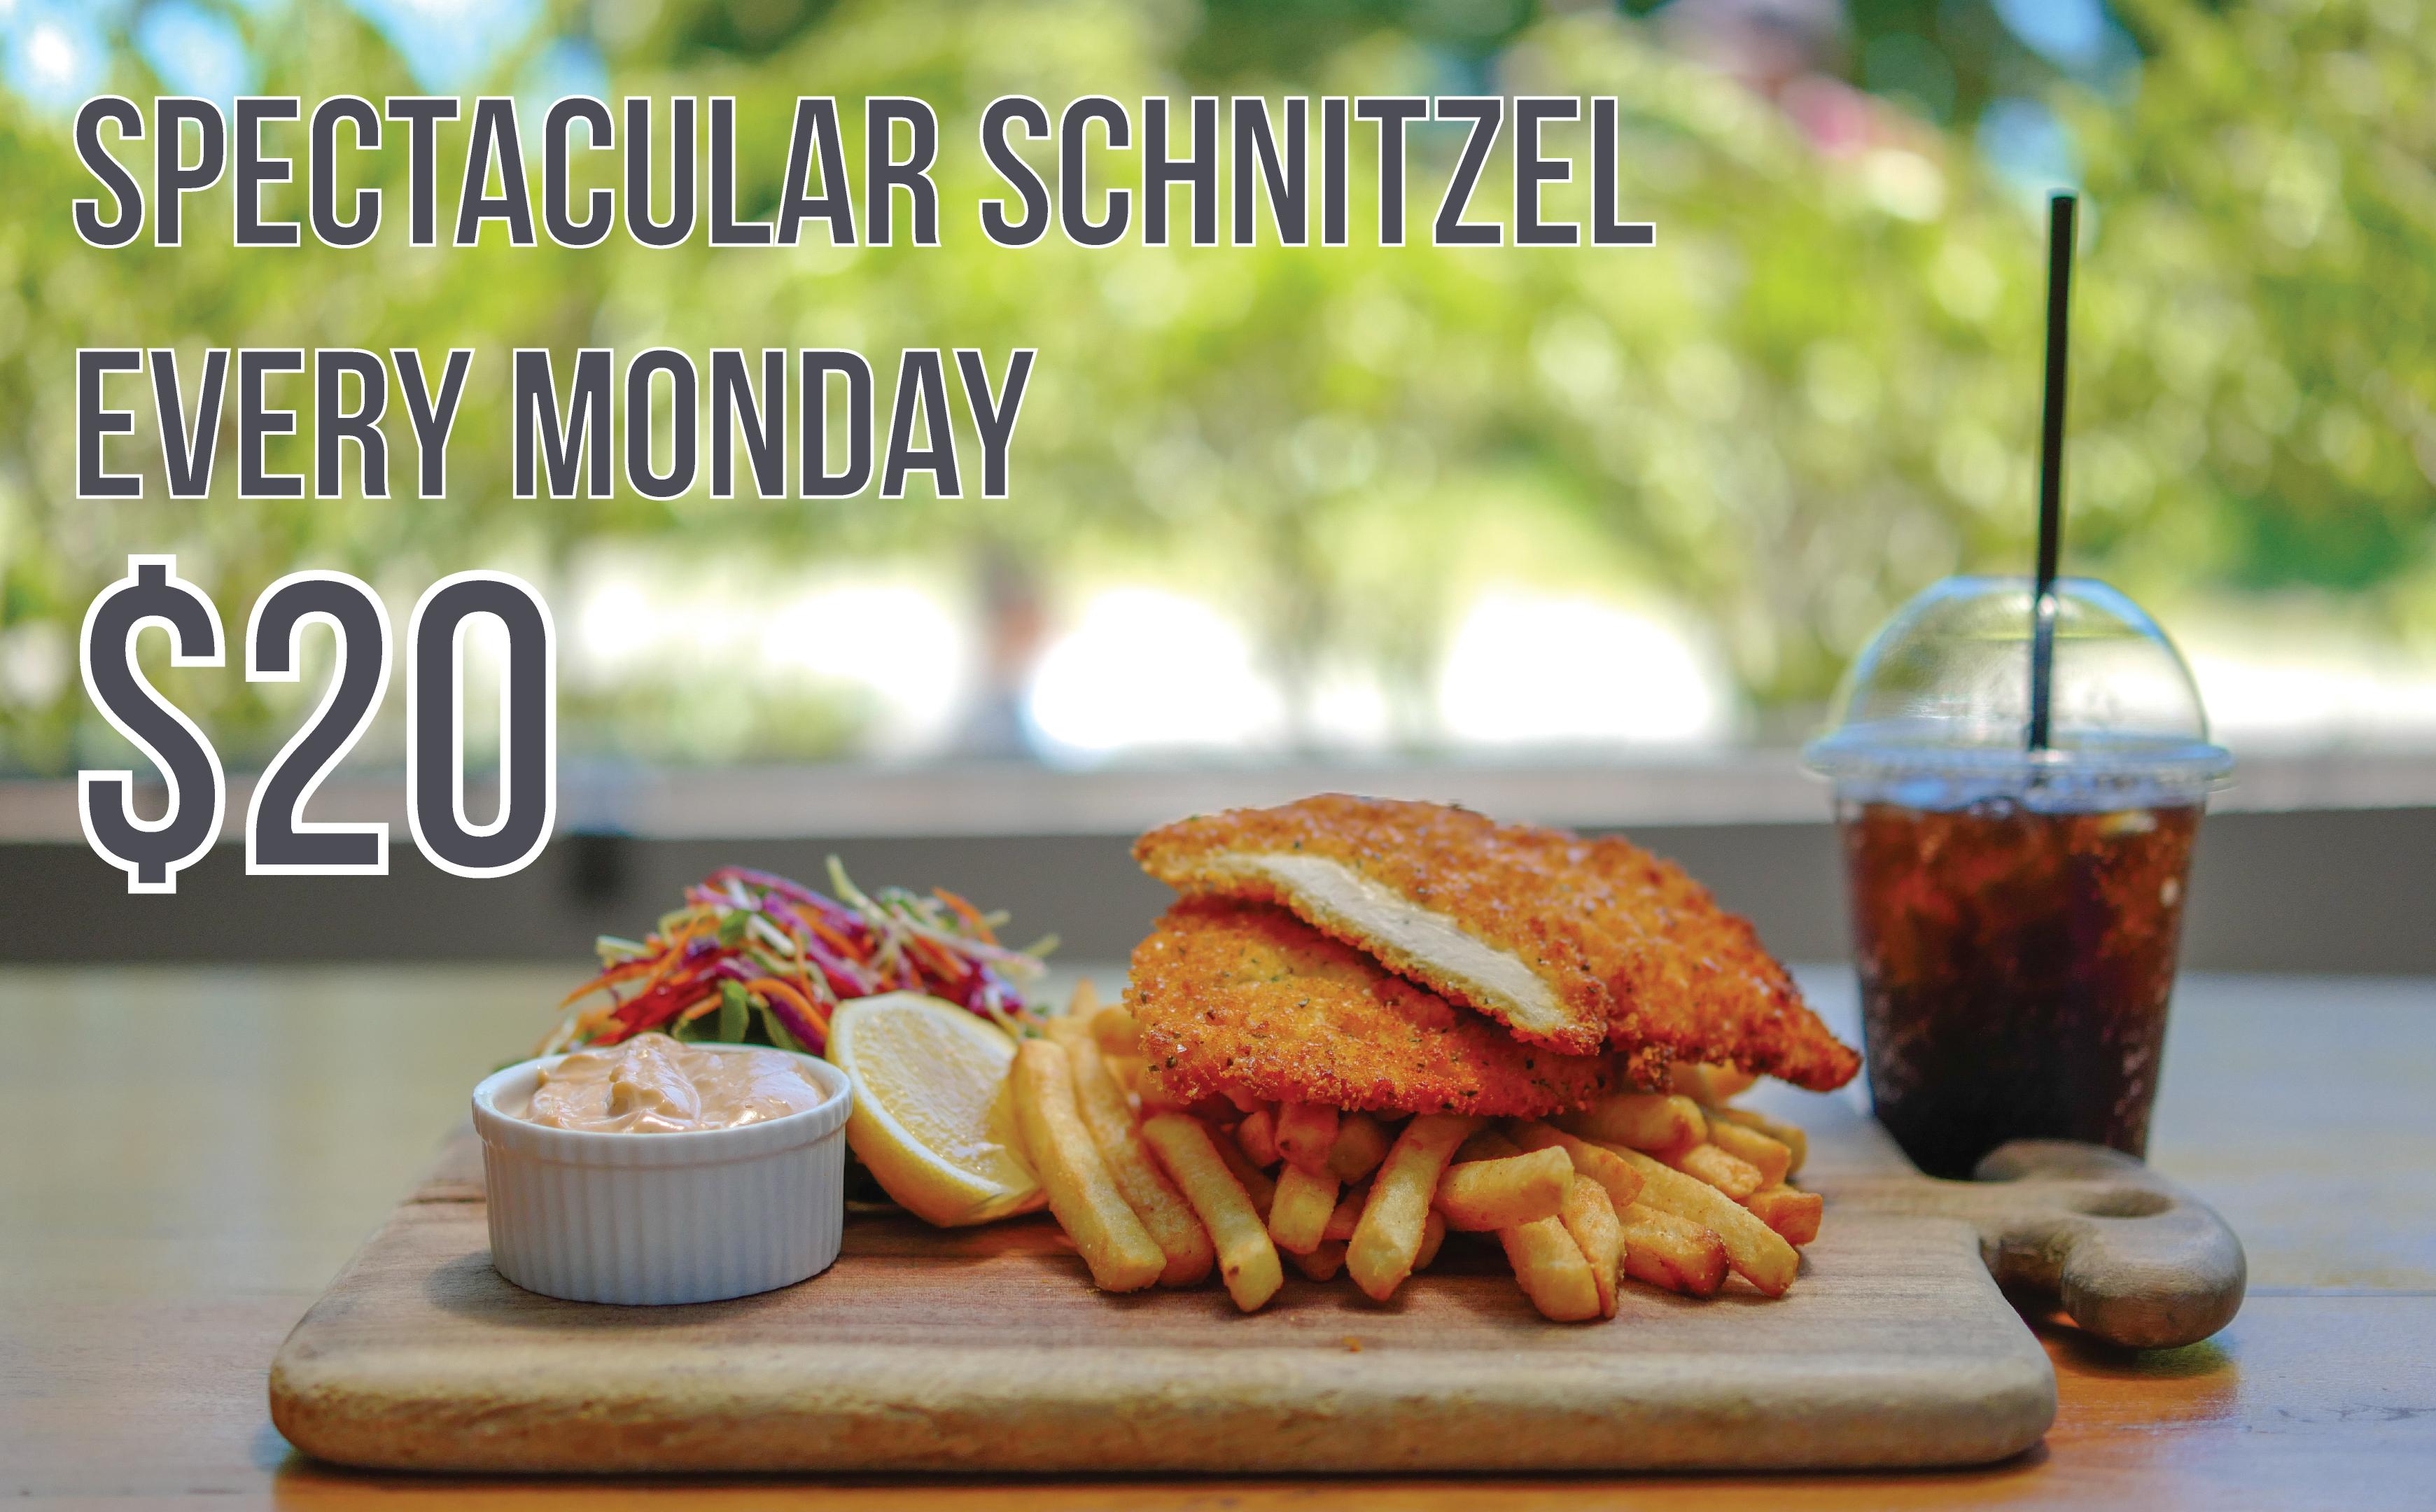 Monday Schnitzel